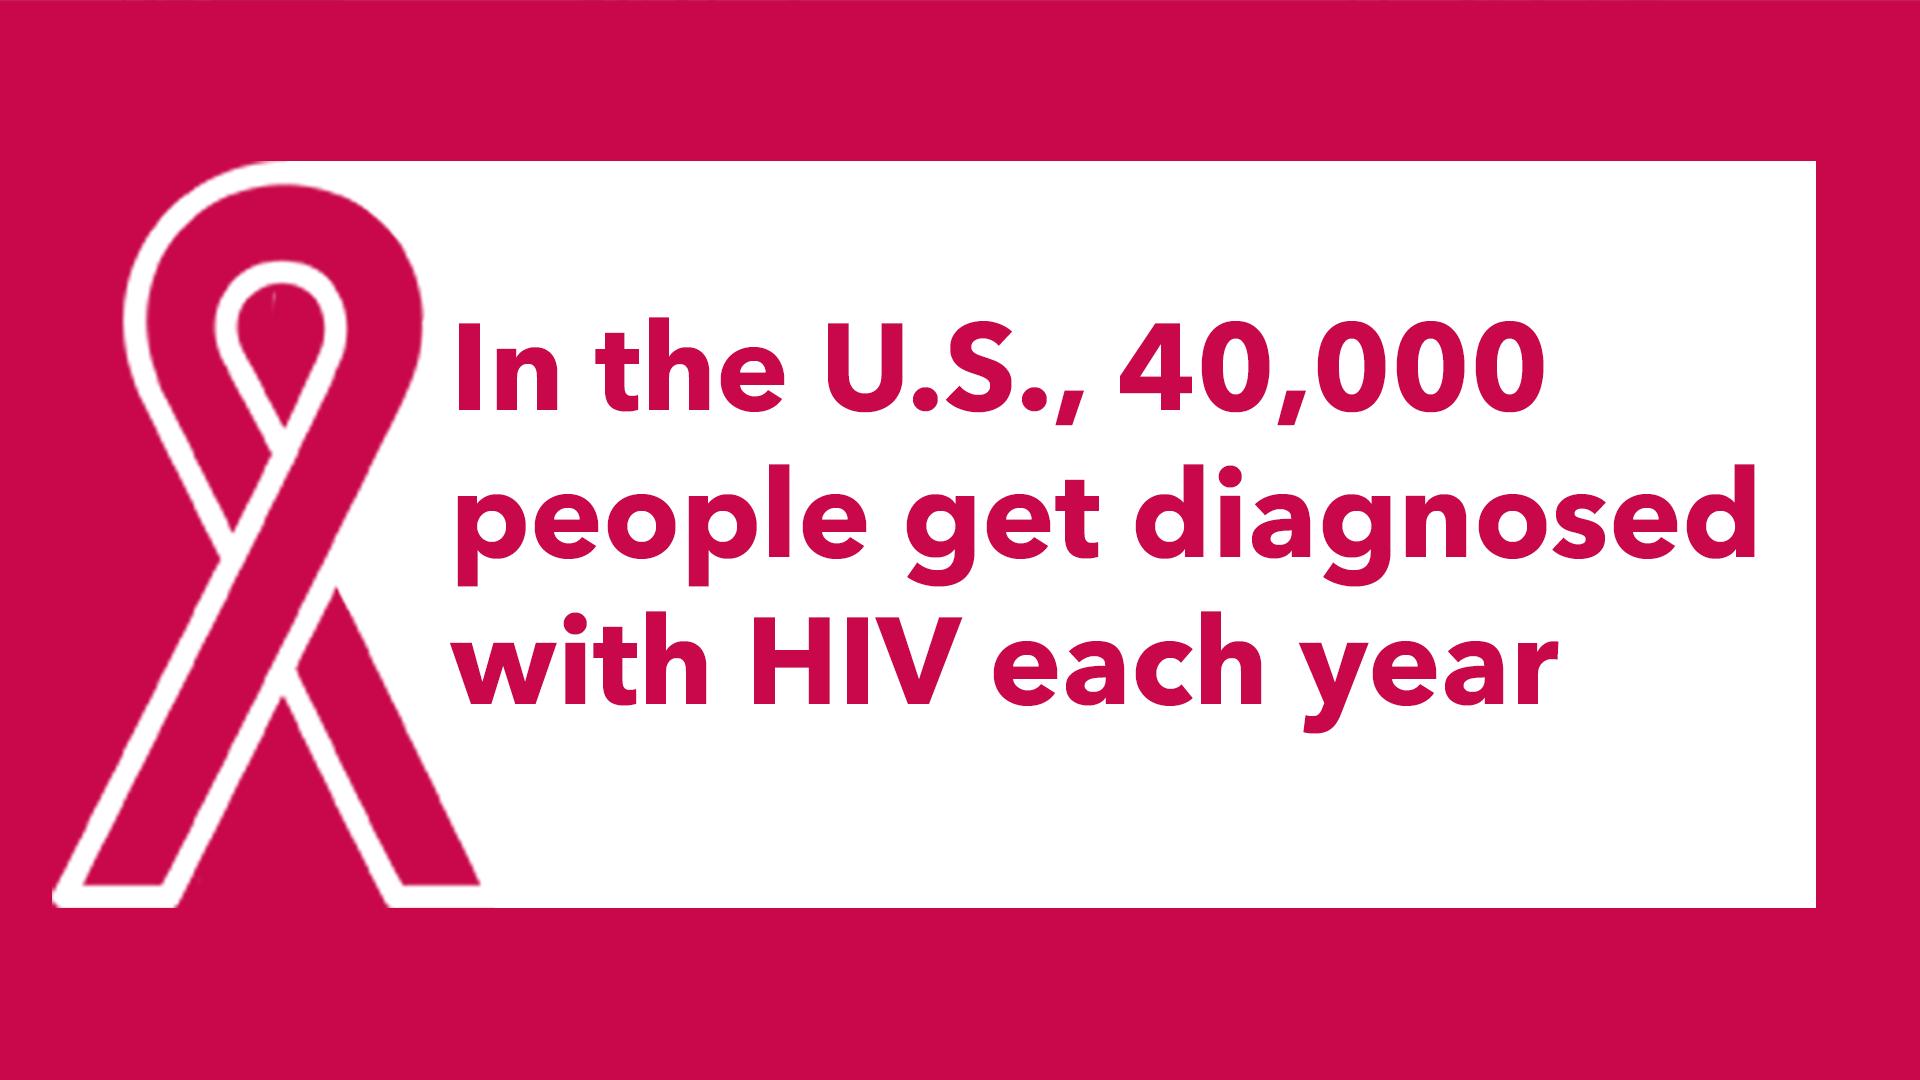 safe preventing aids stds